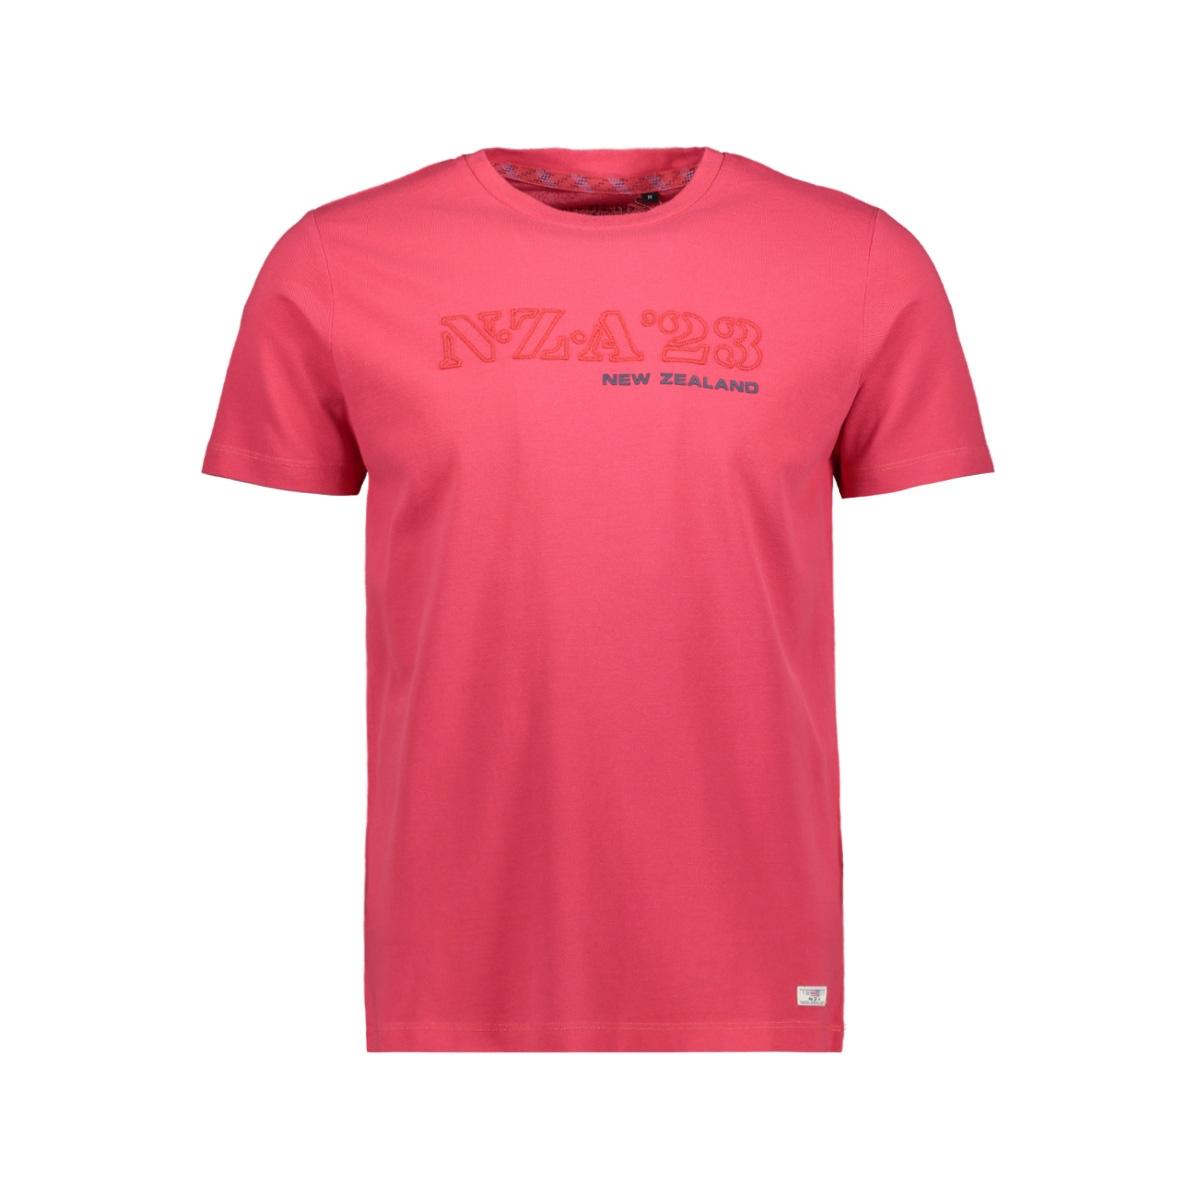 ranfurly 20bn728 nza t-shirt 287 red